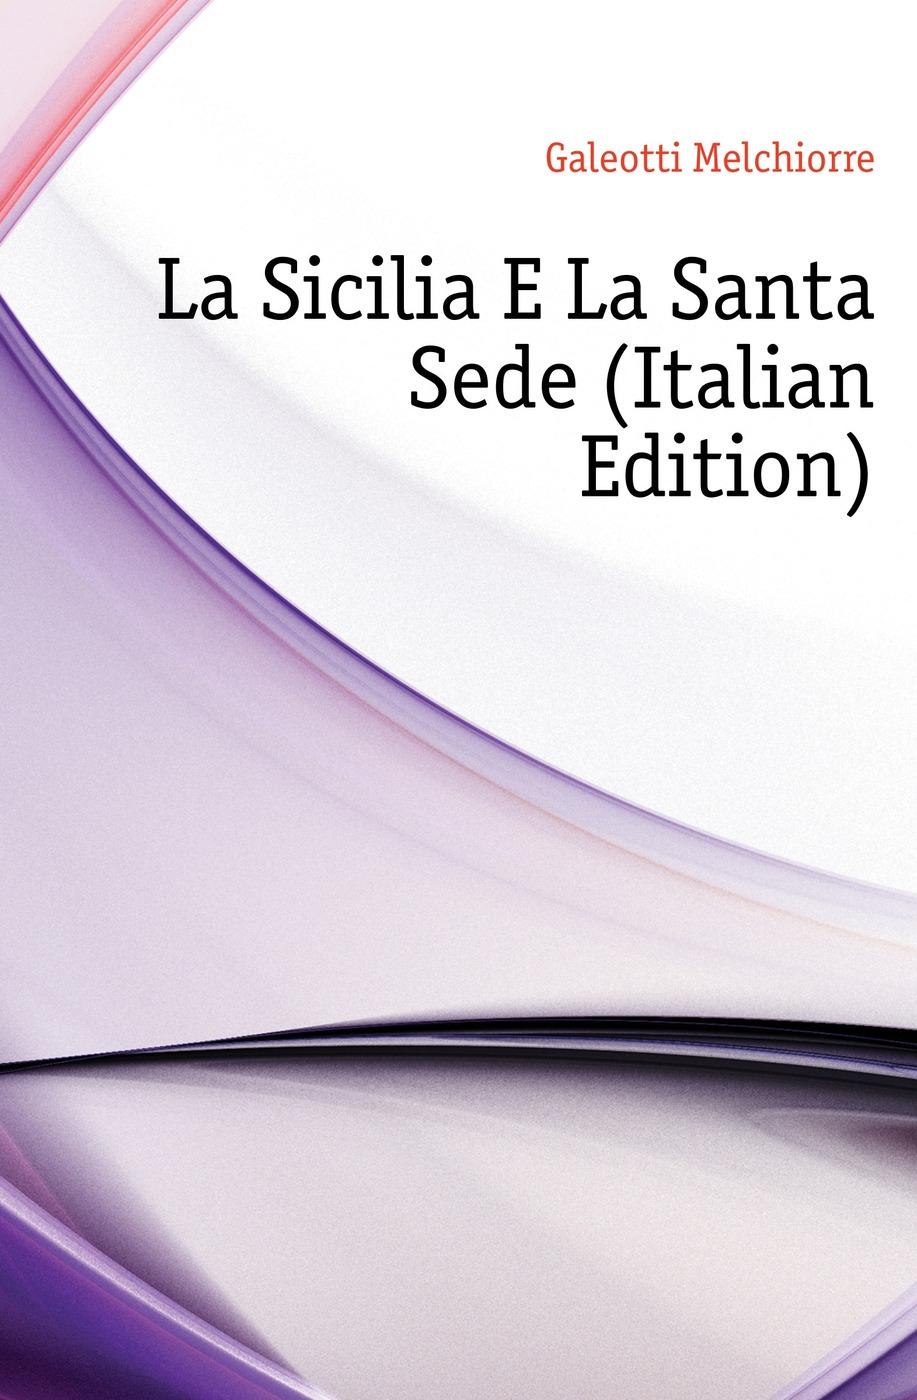 La Sicilia E La Santa Sede (Italian Edition)